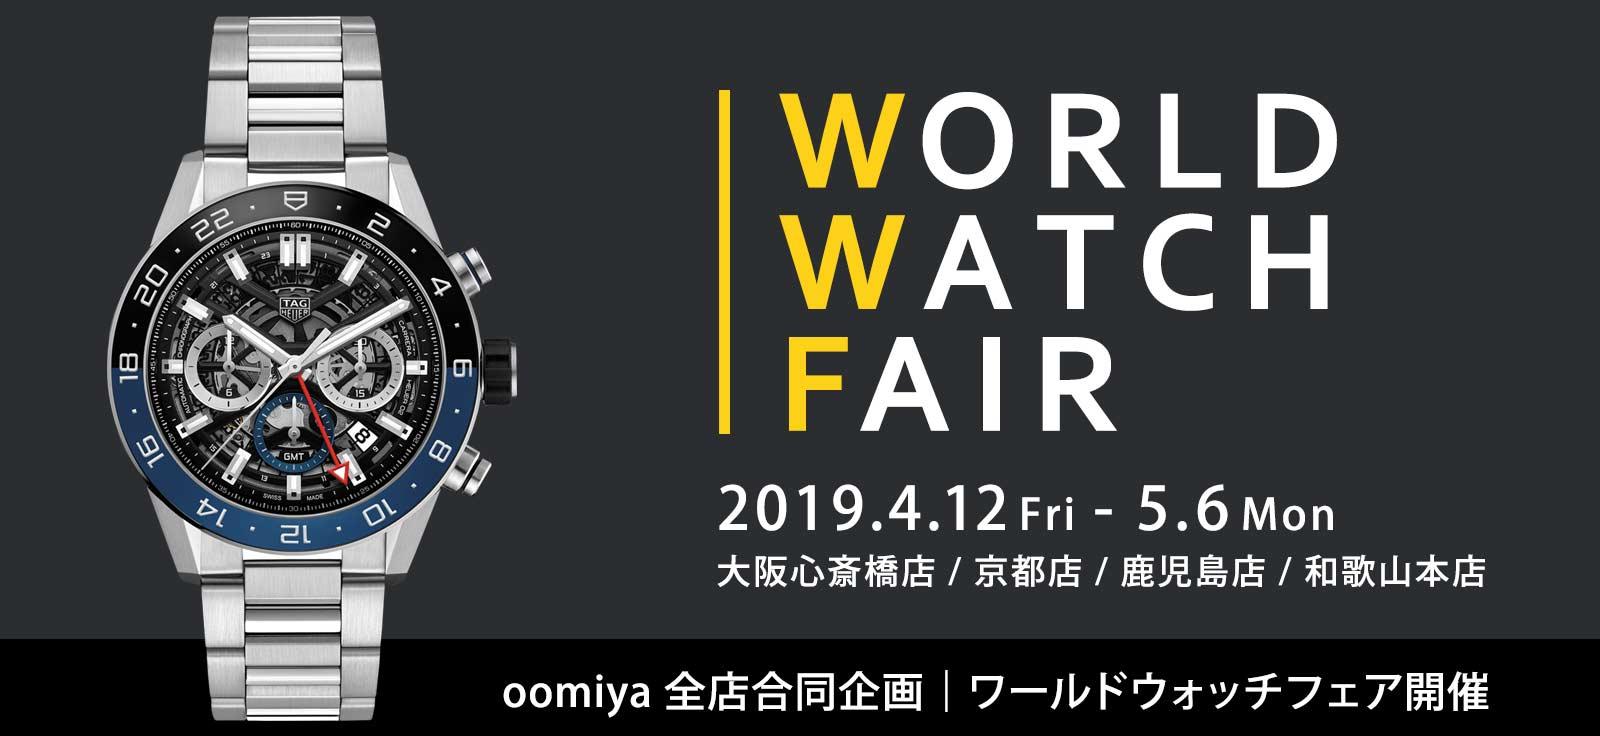 oomiya 全店合同企画 「 WORLD WATCH FAIR 」